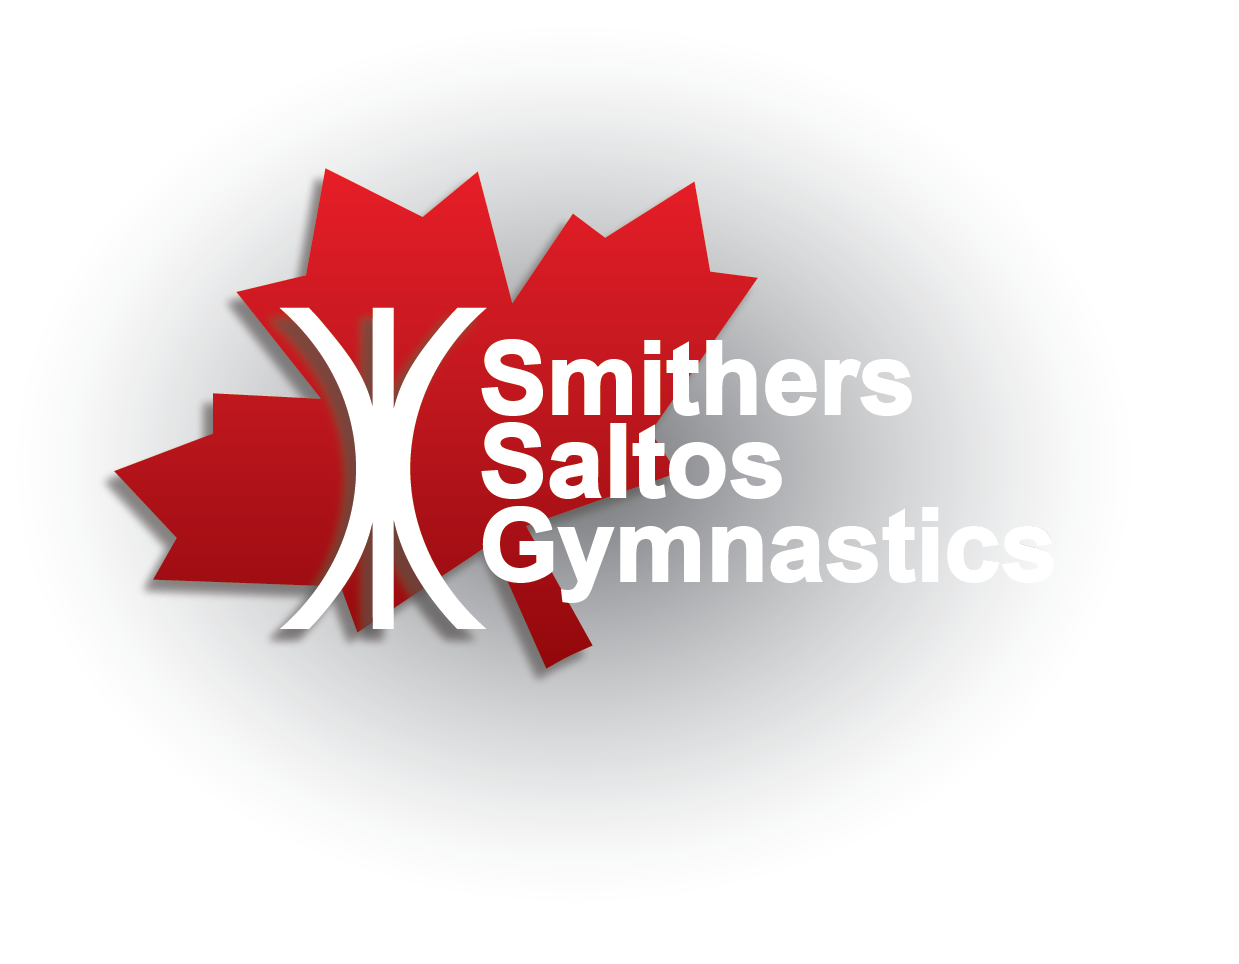 Smithers Saltos Gymnastics Club